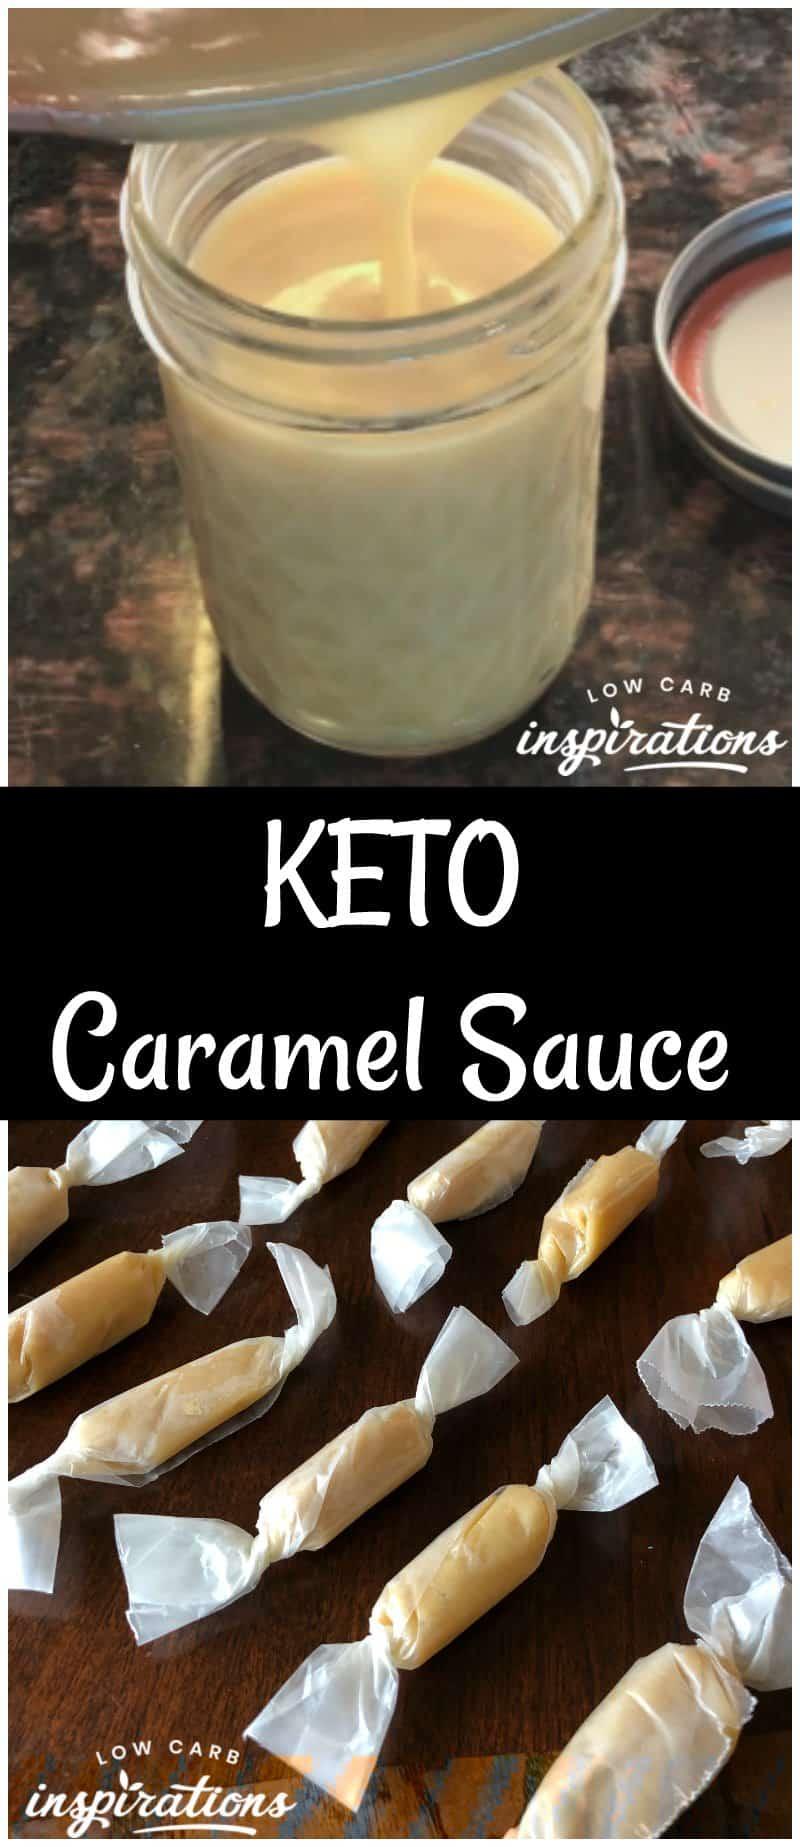 How to Make Sugar Free Caramel Sauce and Keto Caramels!